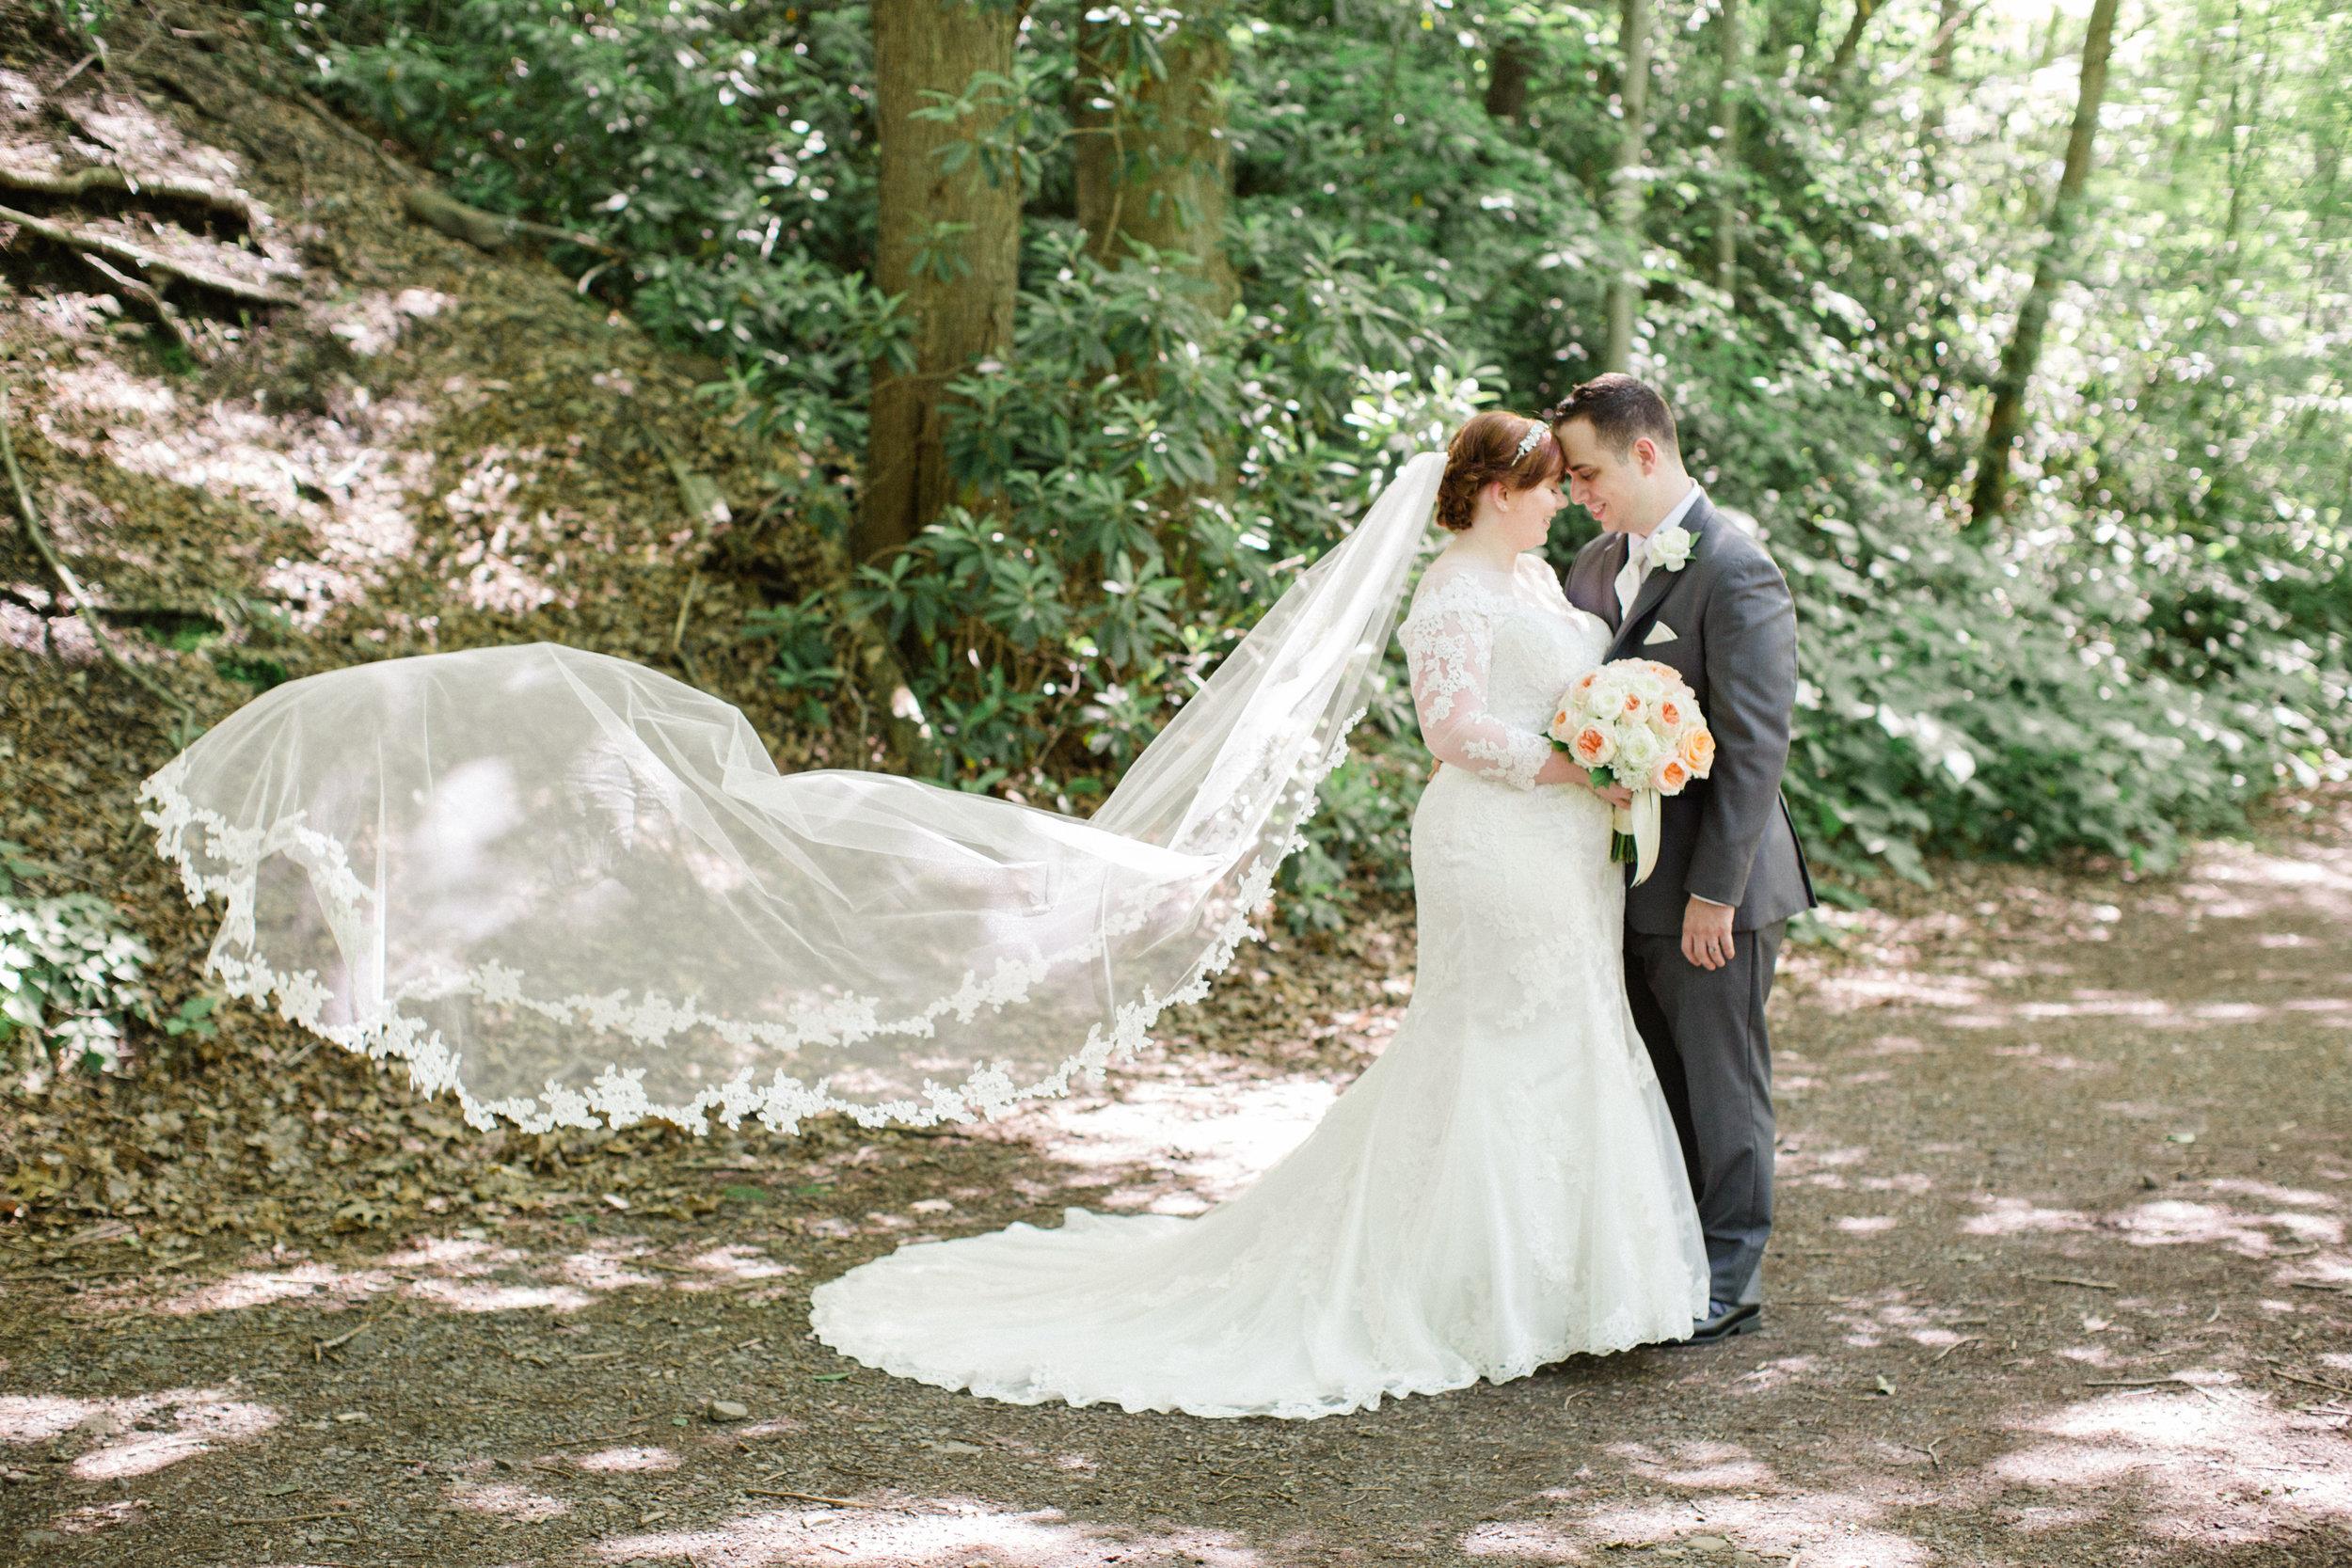 Fiorellis Wedding Photos_JDP-110.jpg